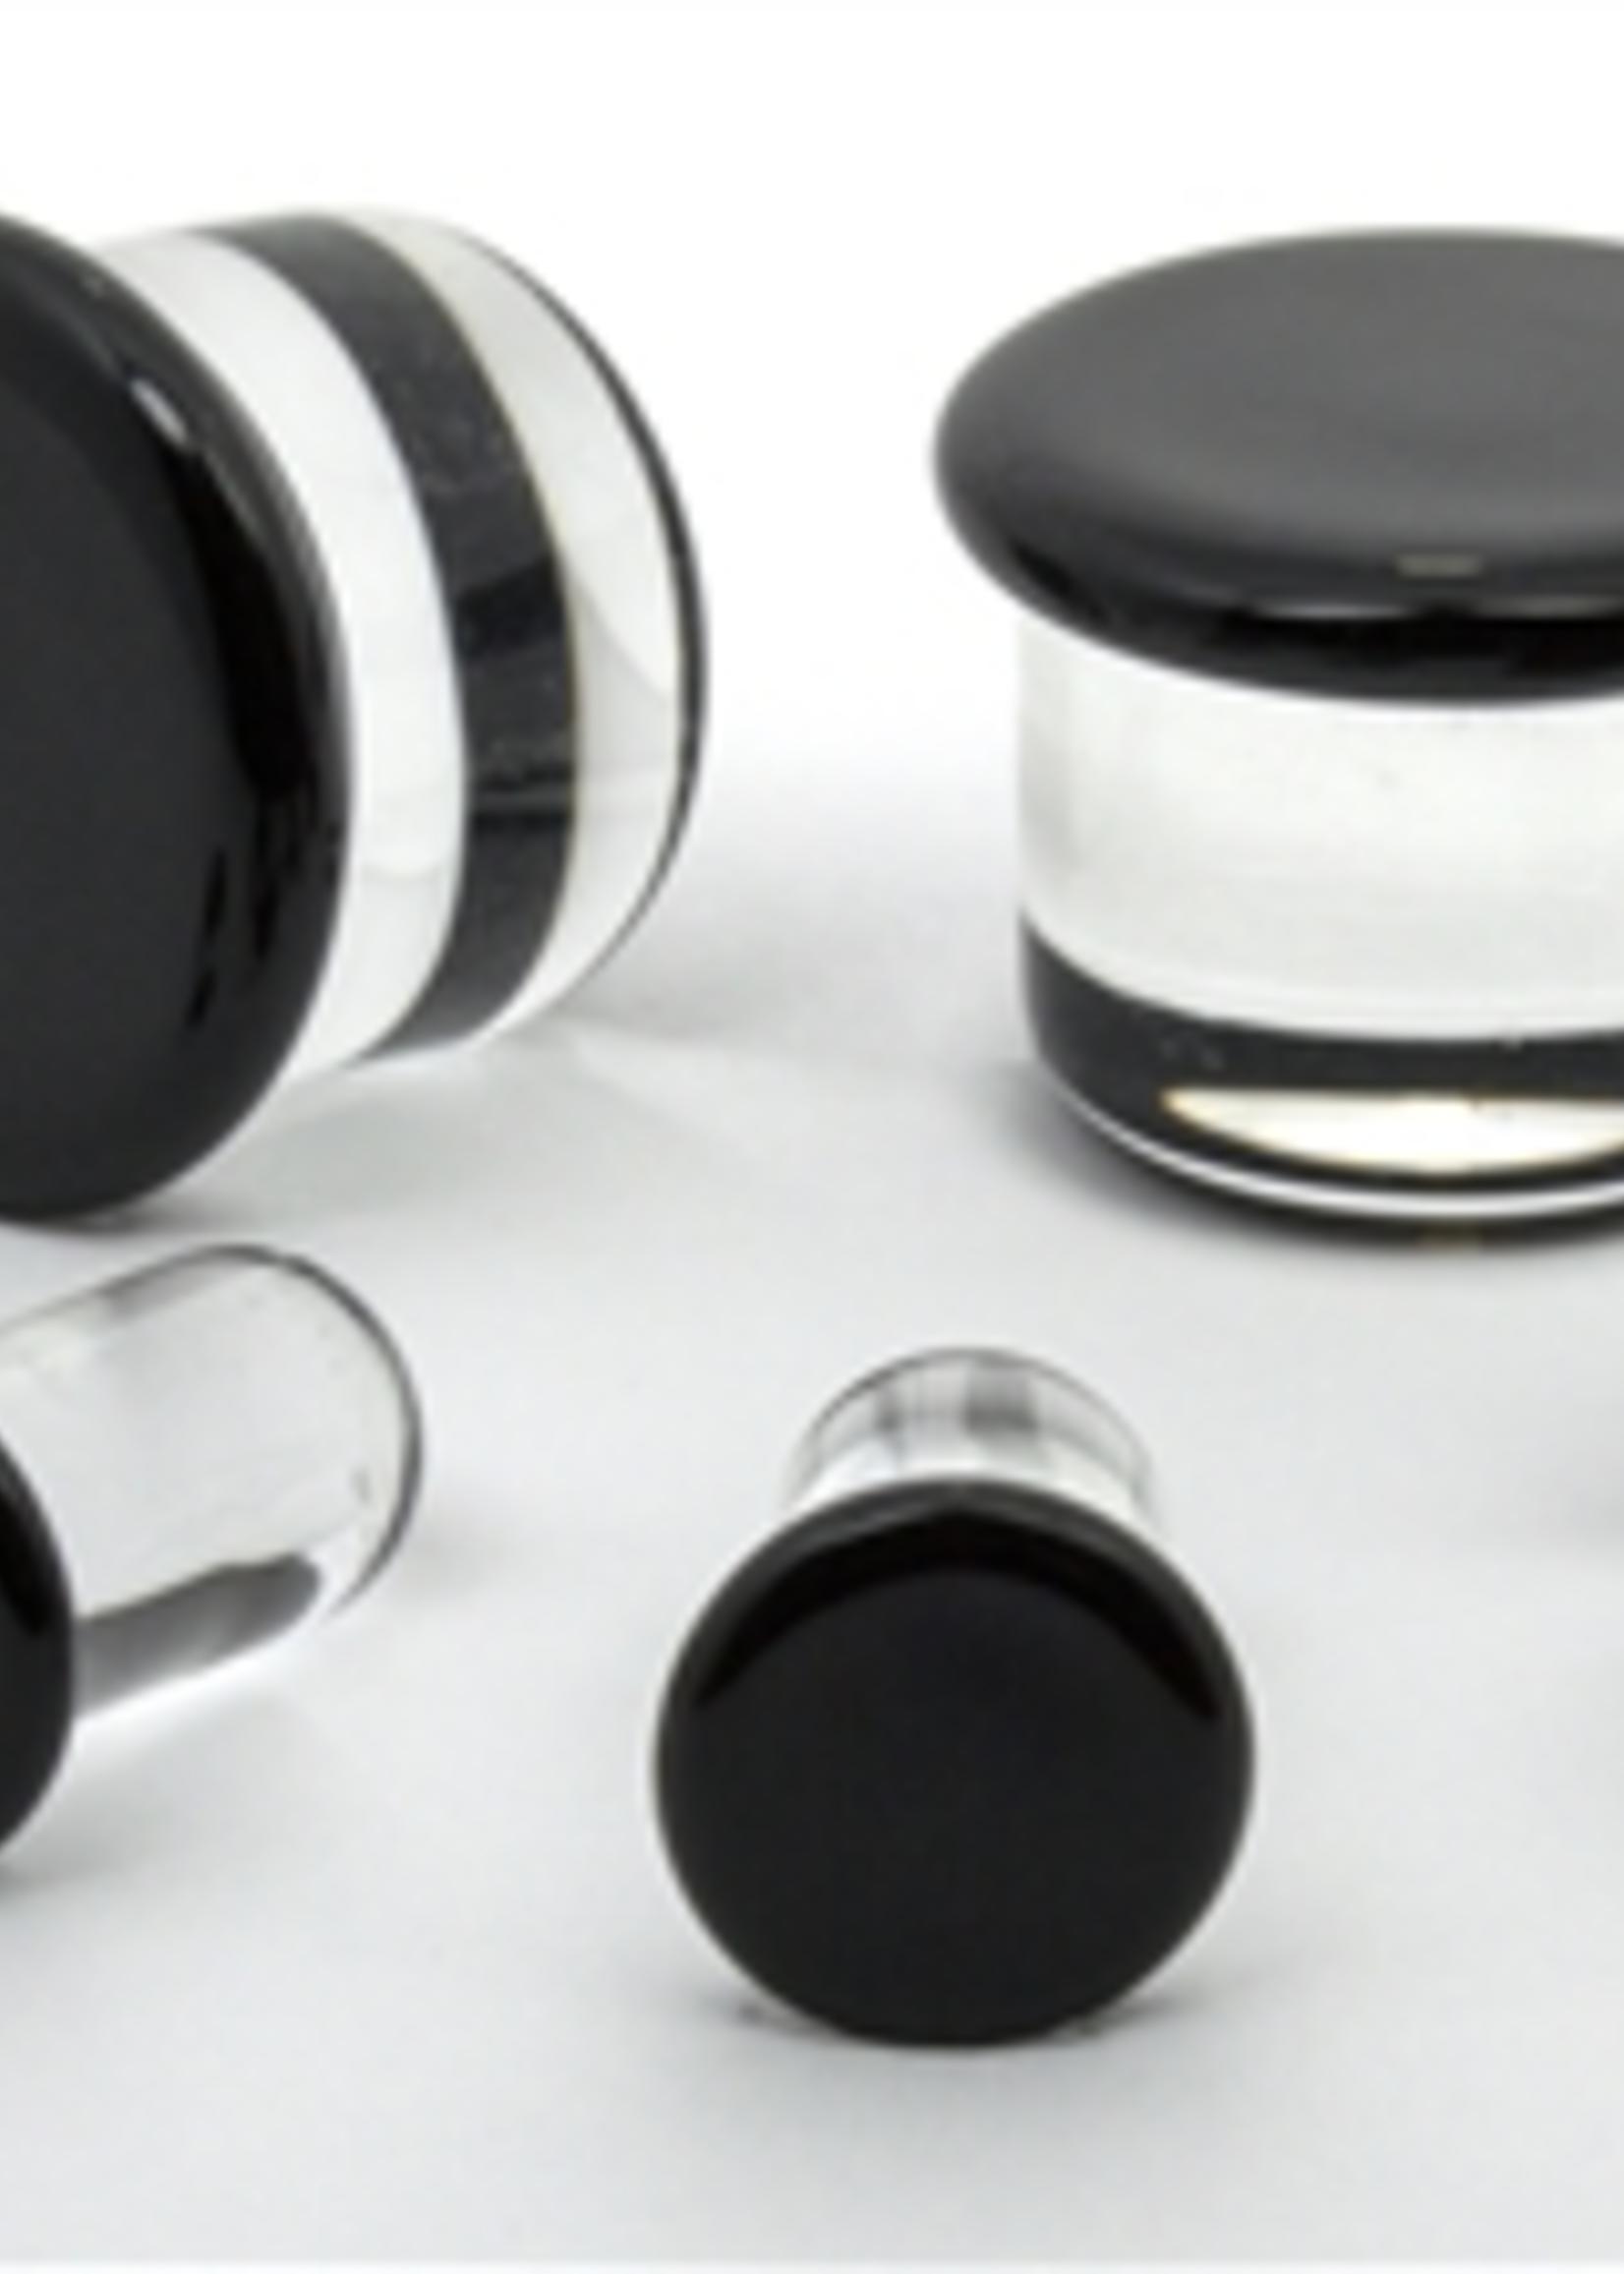 7.5mm Half Size SF Glass Plugs